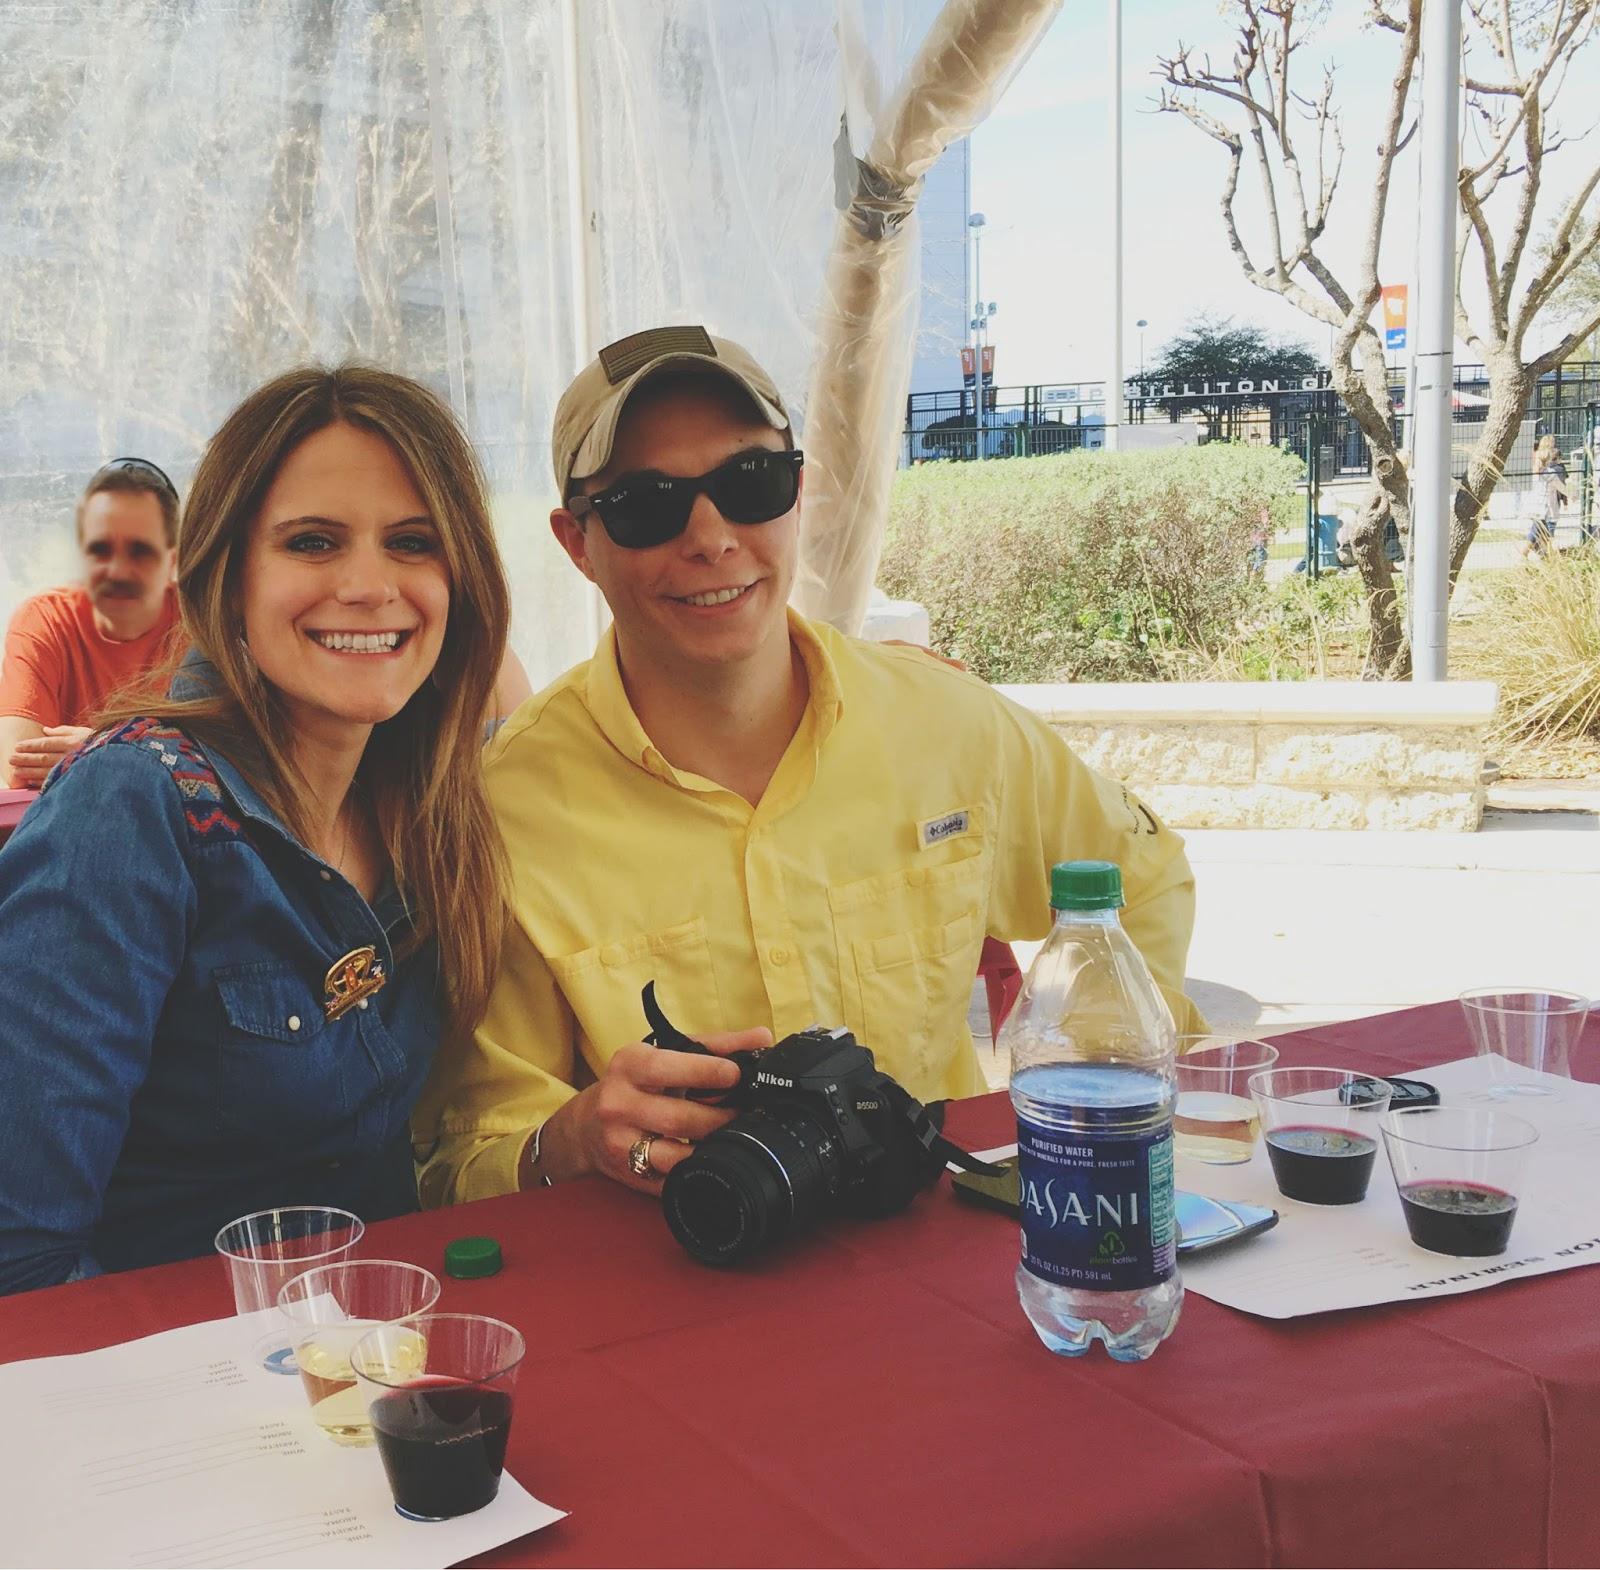 2016 Houston Livestock Show and Rodeo Champion Wine Garden wine and pizza seminar